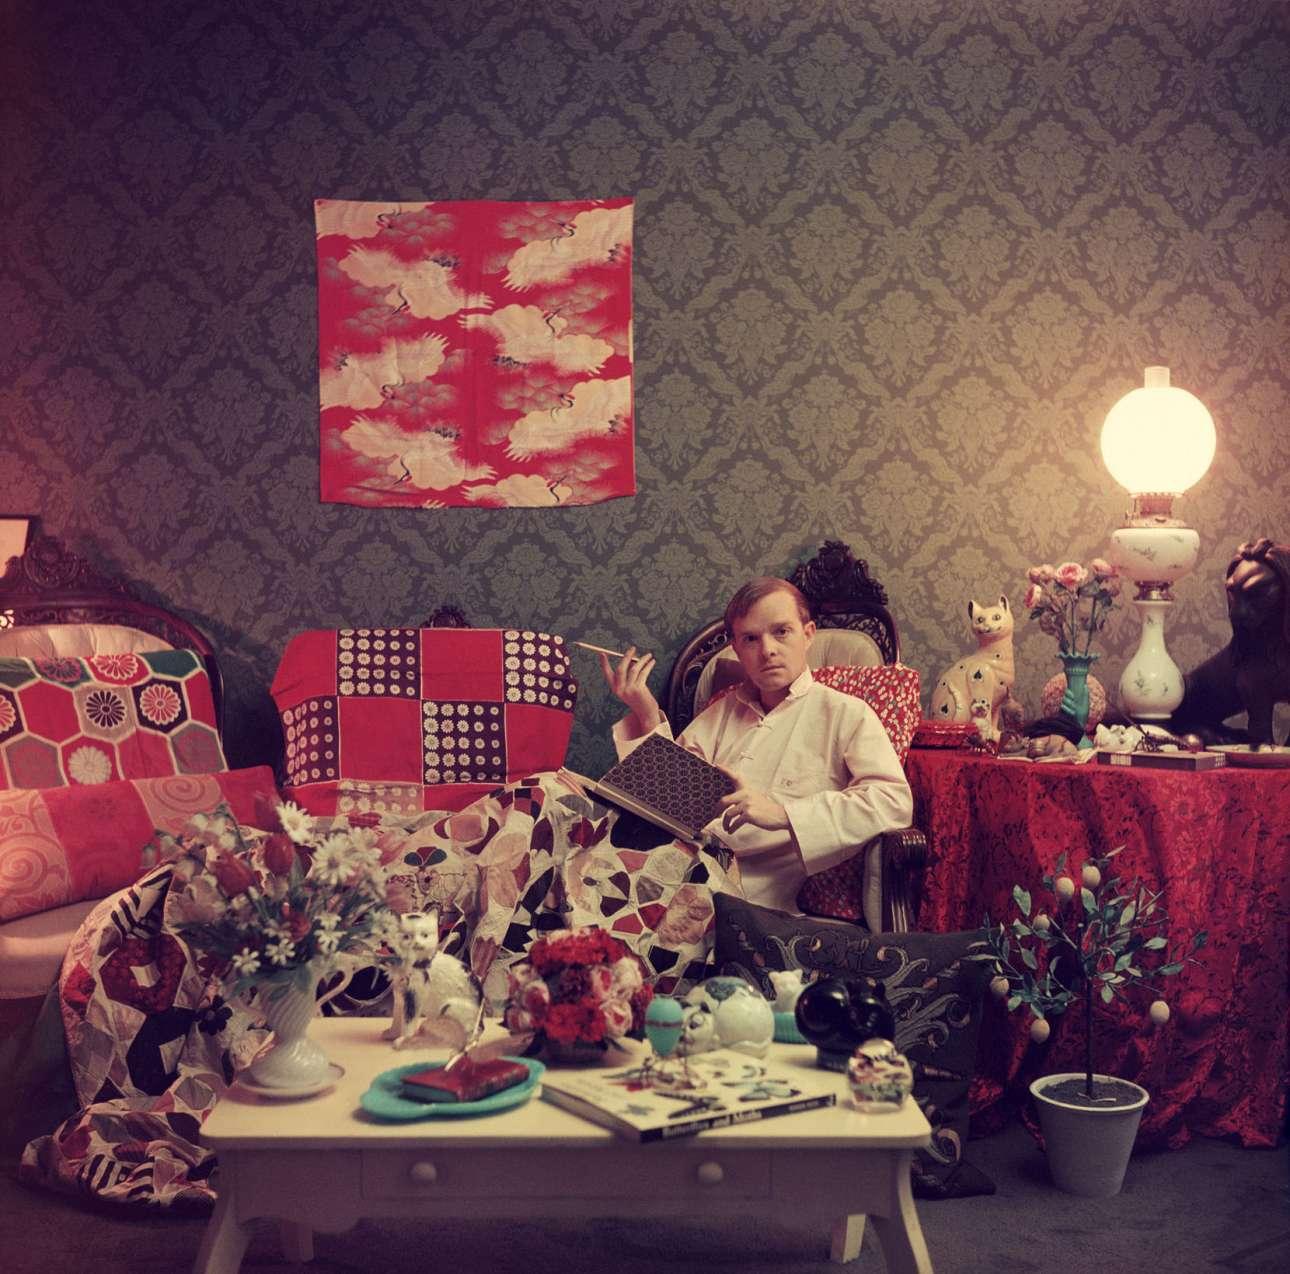 O ξεχωριστός συγγραφέας Τρούμαν Καπότε στο σπίτι του στην περιοχή Brooklyn Heights της Νέας Υόρκης, το 1958